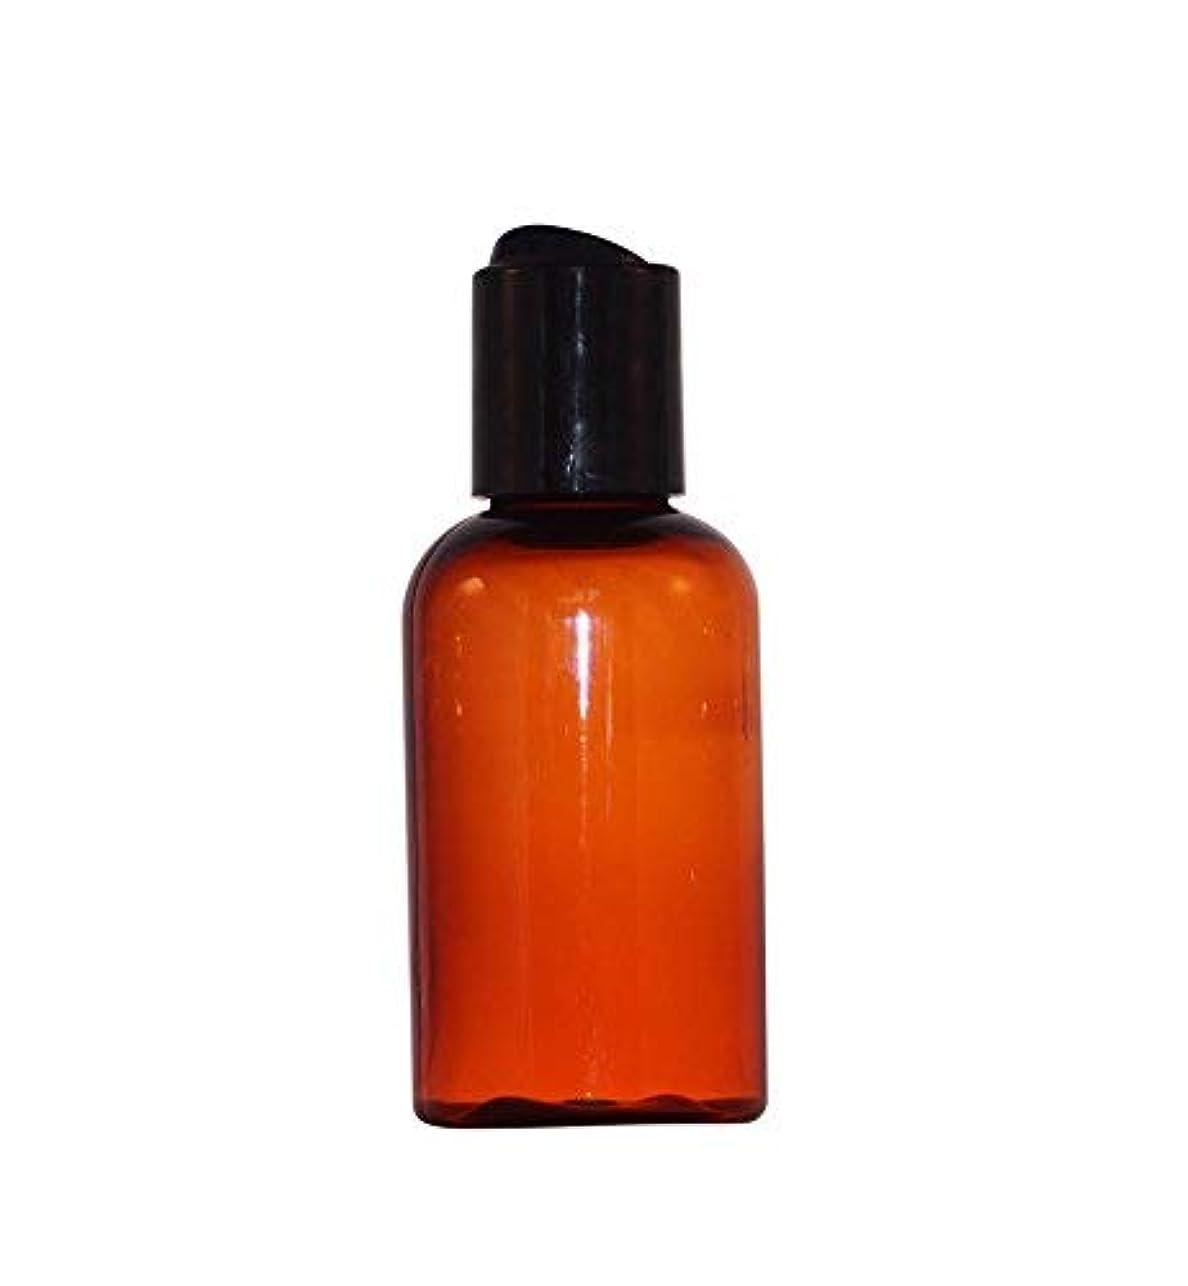 WM (Bulk Pack of 24) 2 oz Amber Refillable, Reusable Bottle W/Press Disc Cap. Travel, DIY Lotion, Shampoo, Soap...